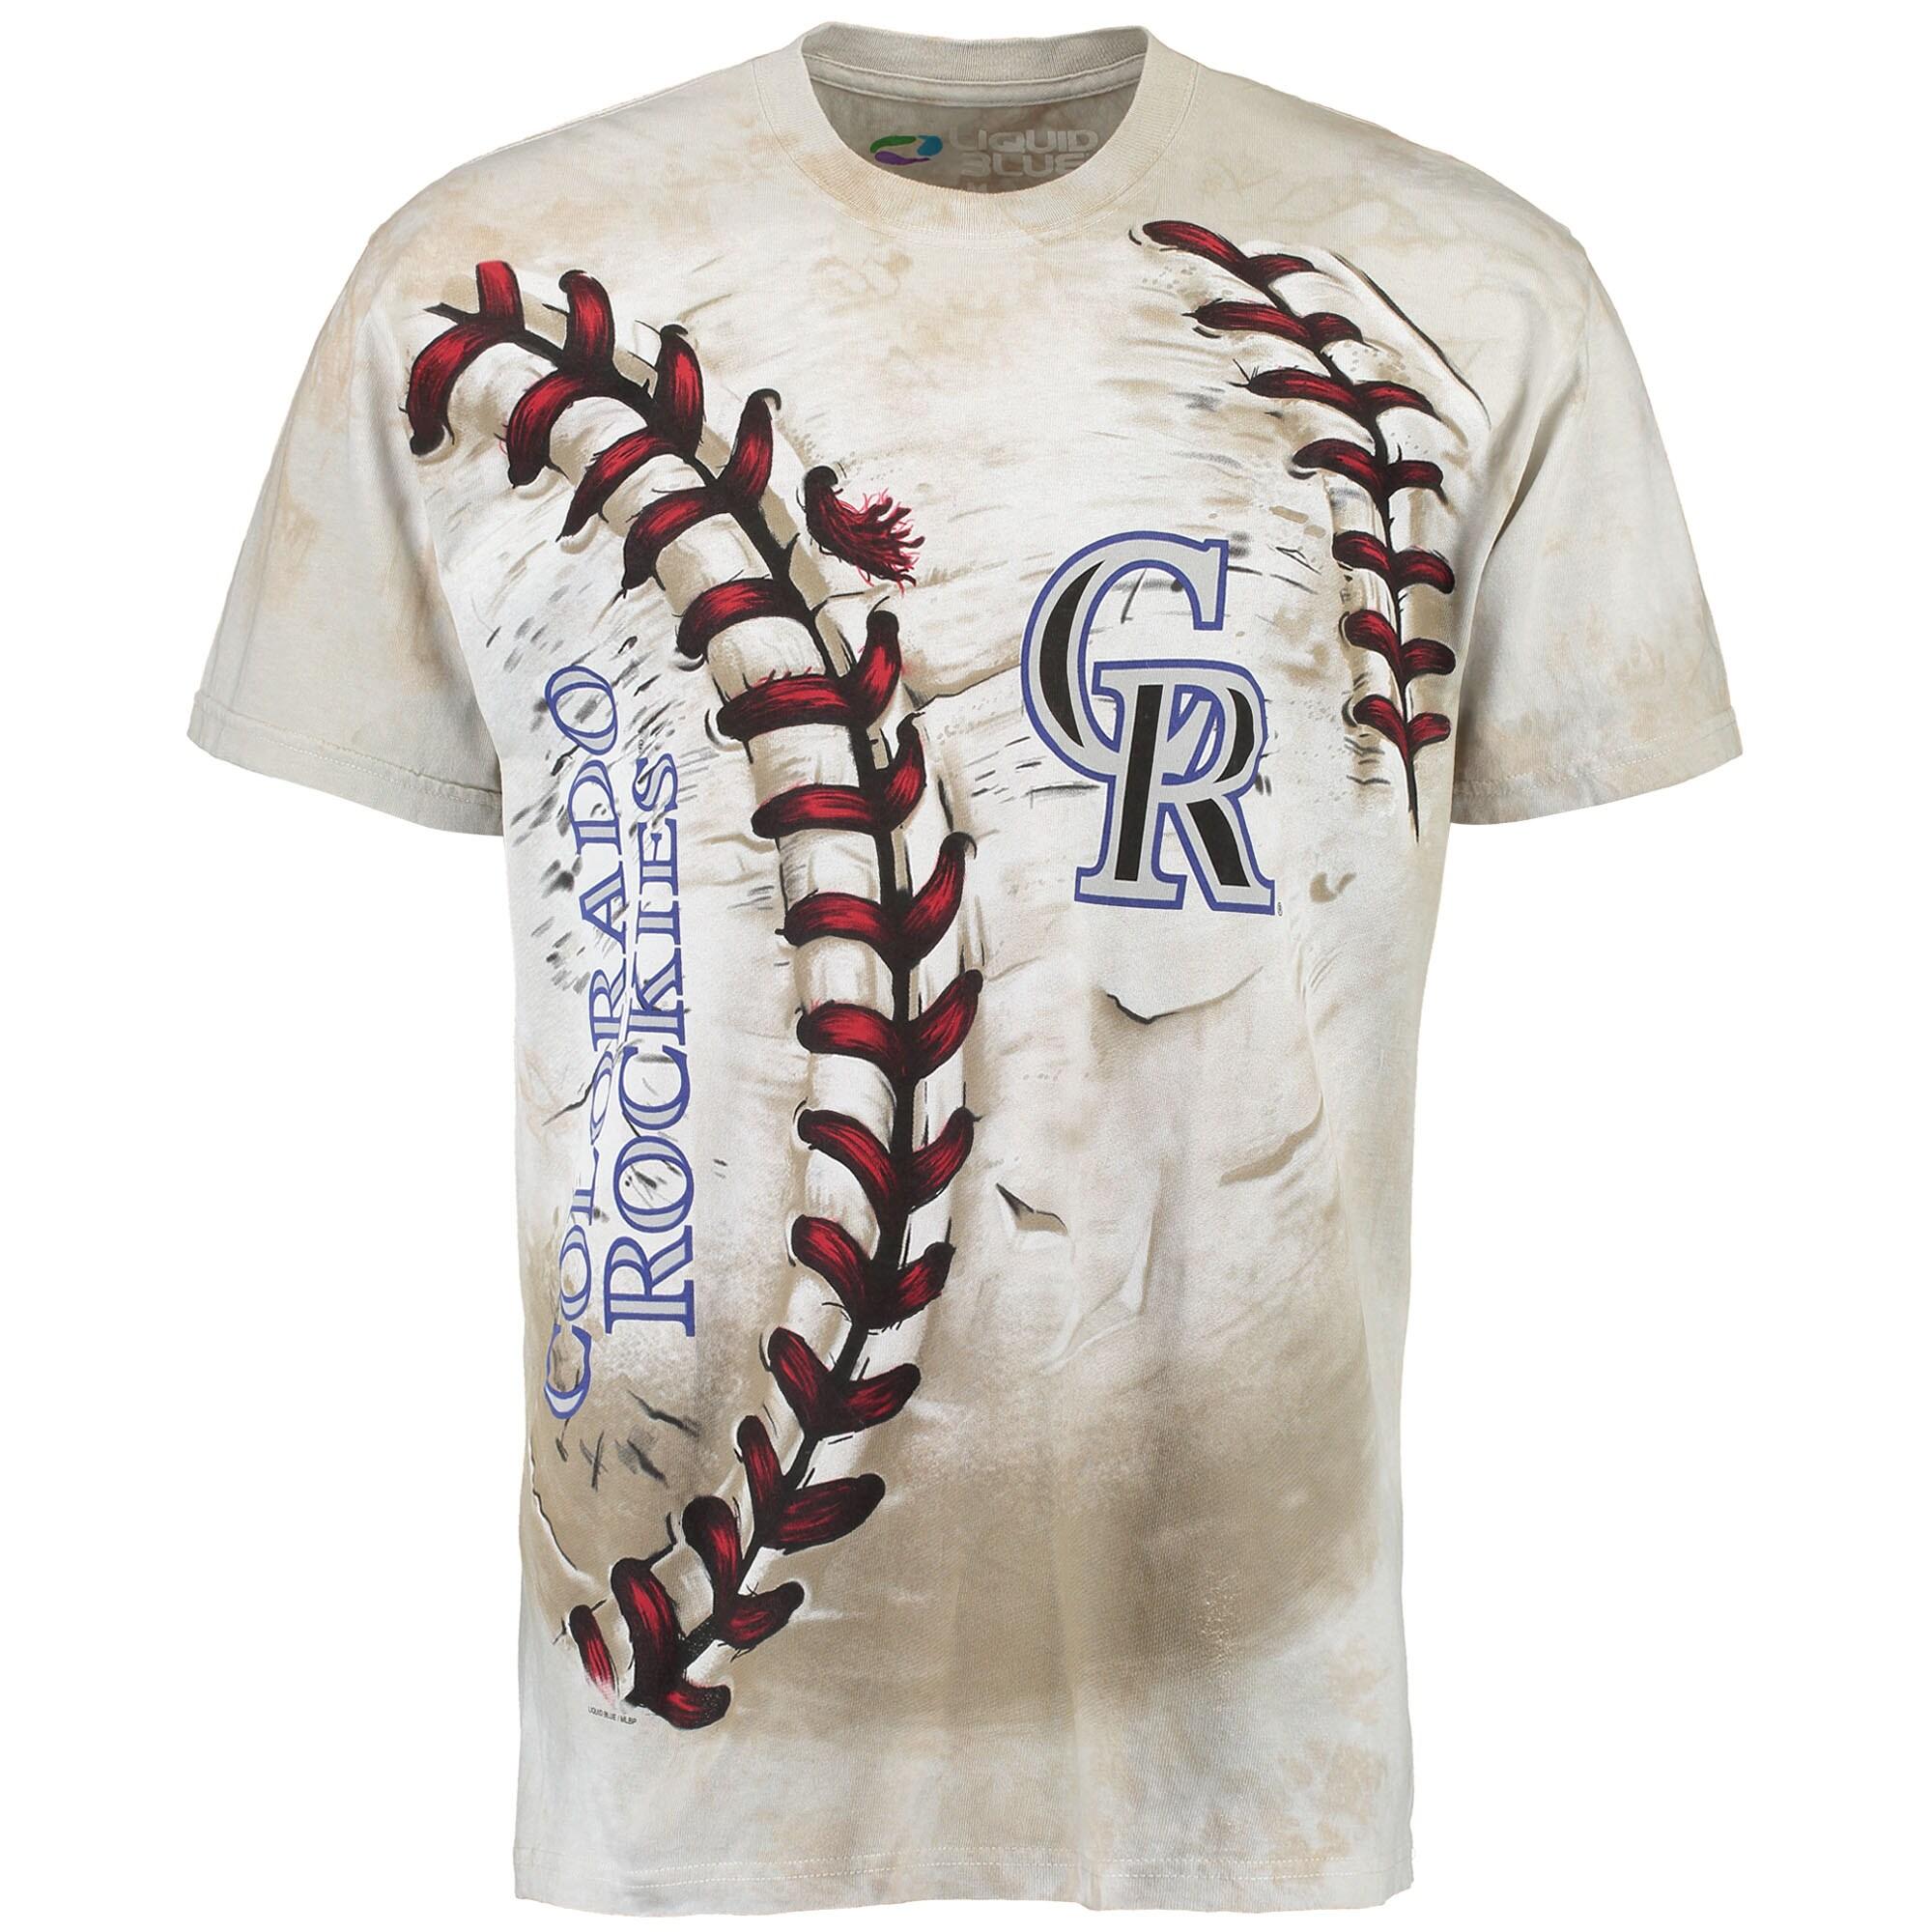 Colorado Rockies Hardball Tie-Dye T- Shirt - Cream